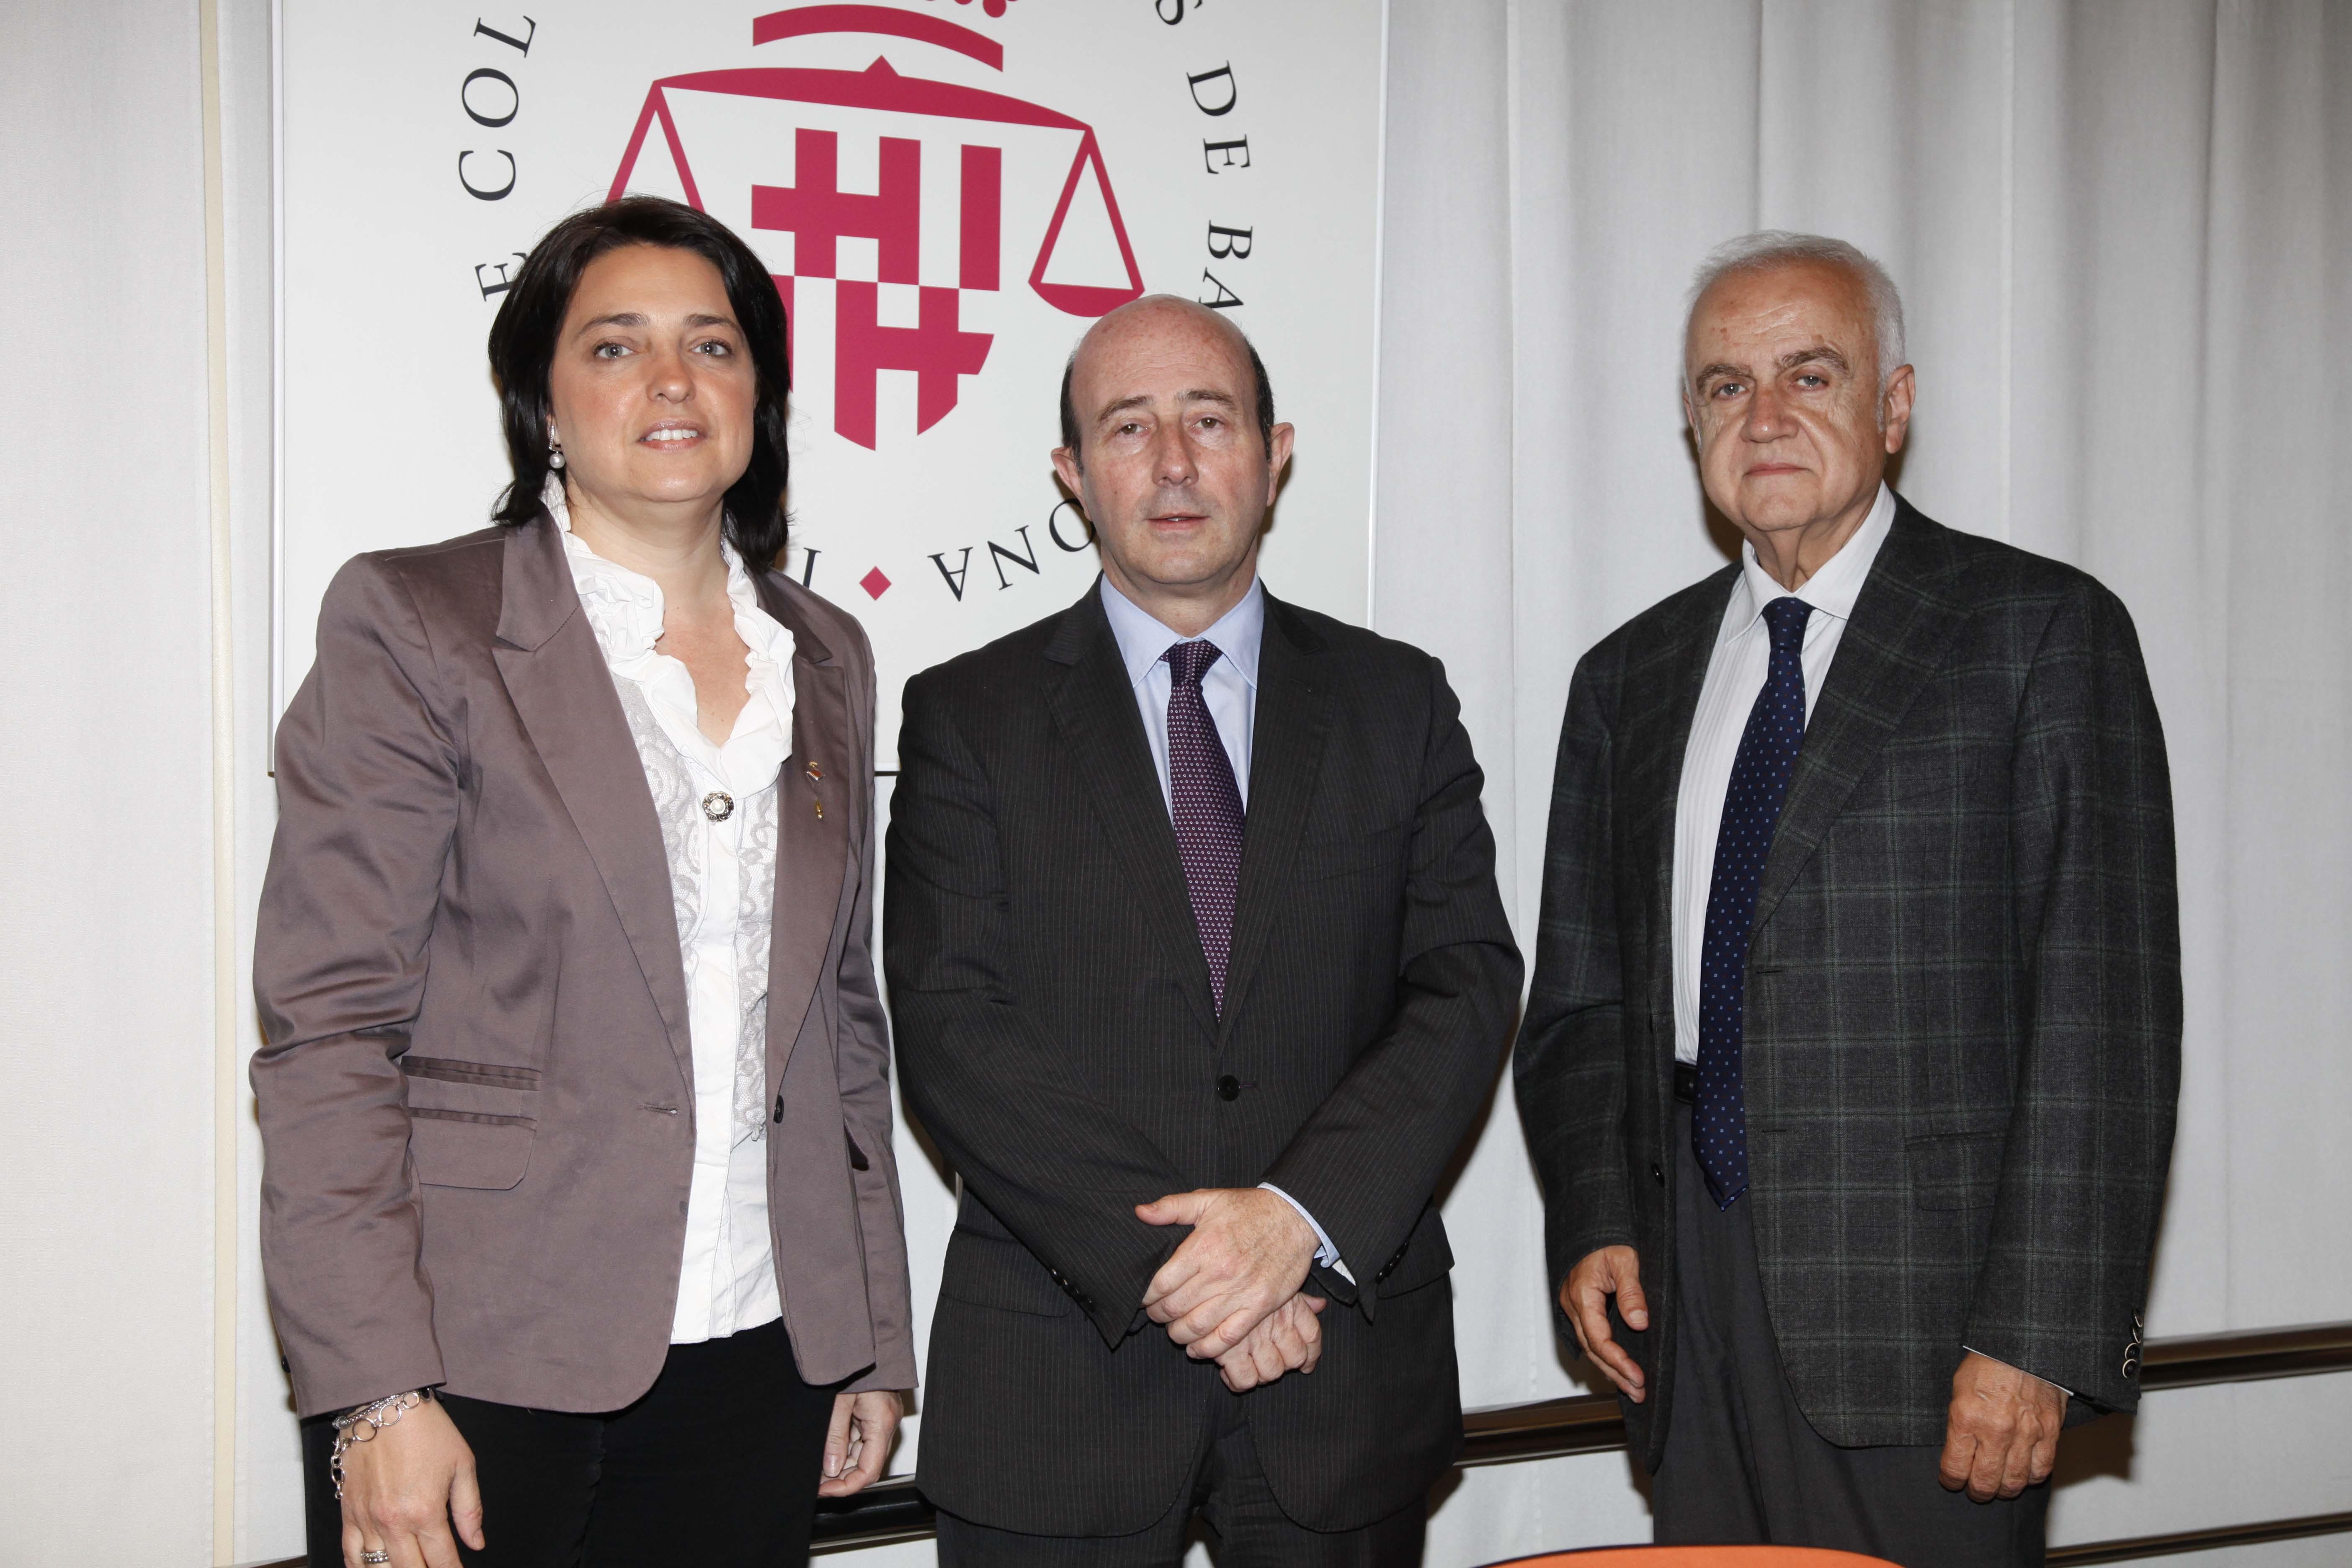 Sònia Recasens, Pedro L. Yúfera y Daniel Faura